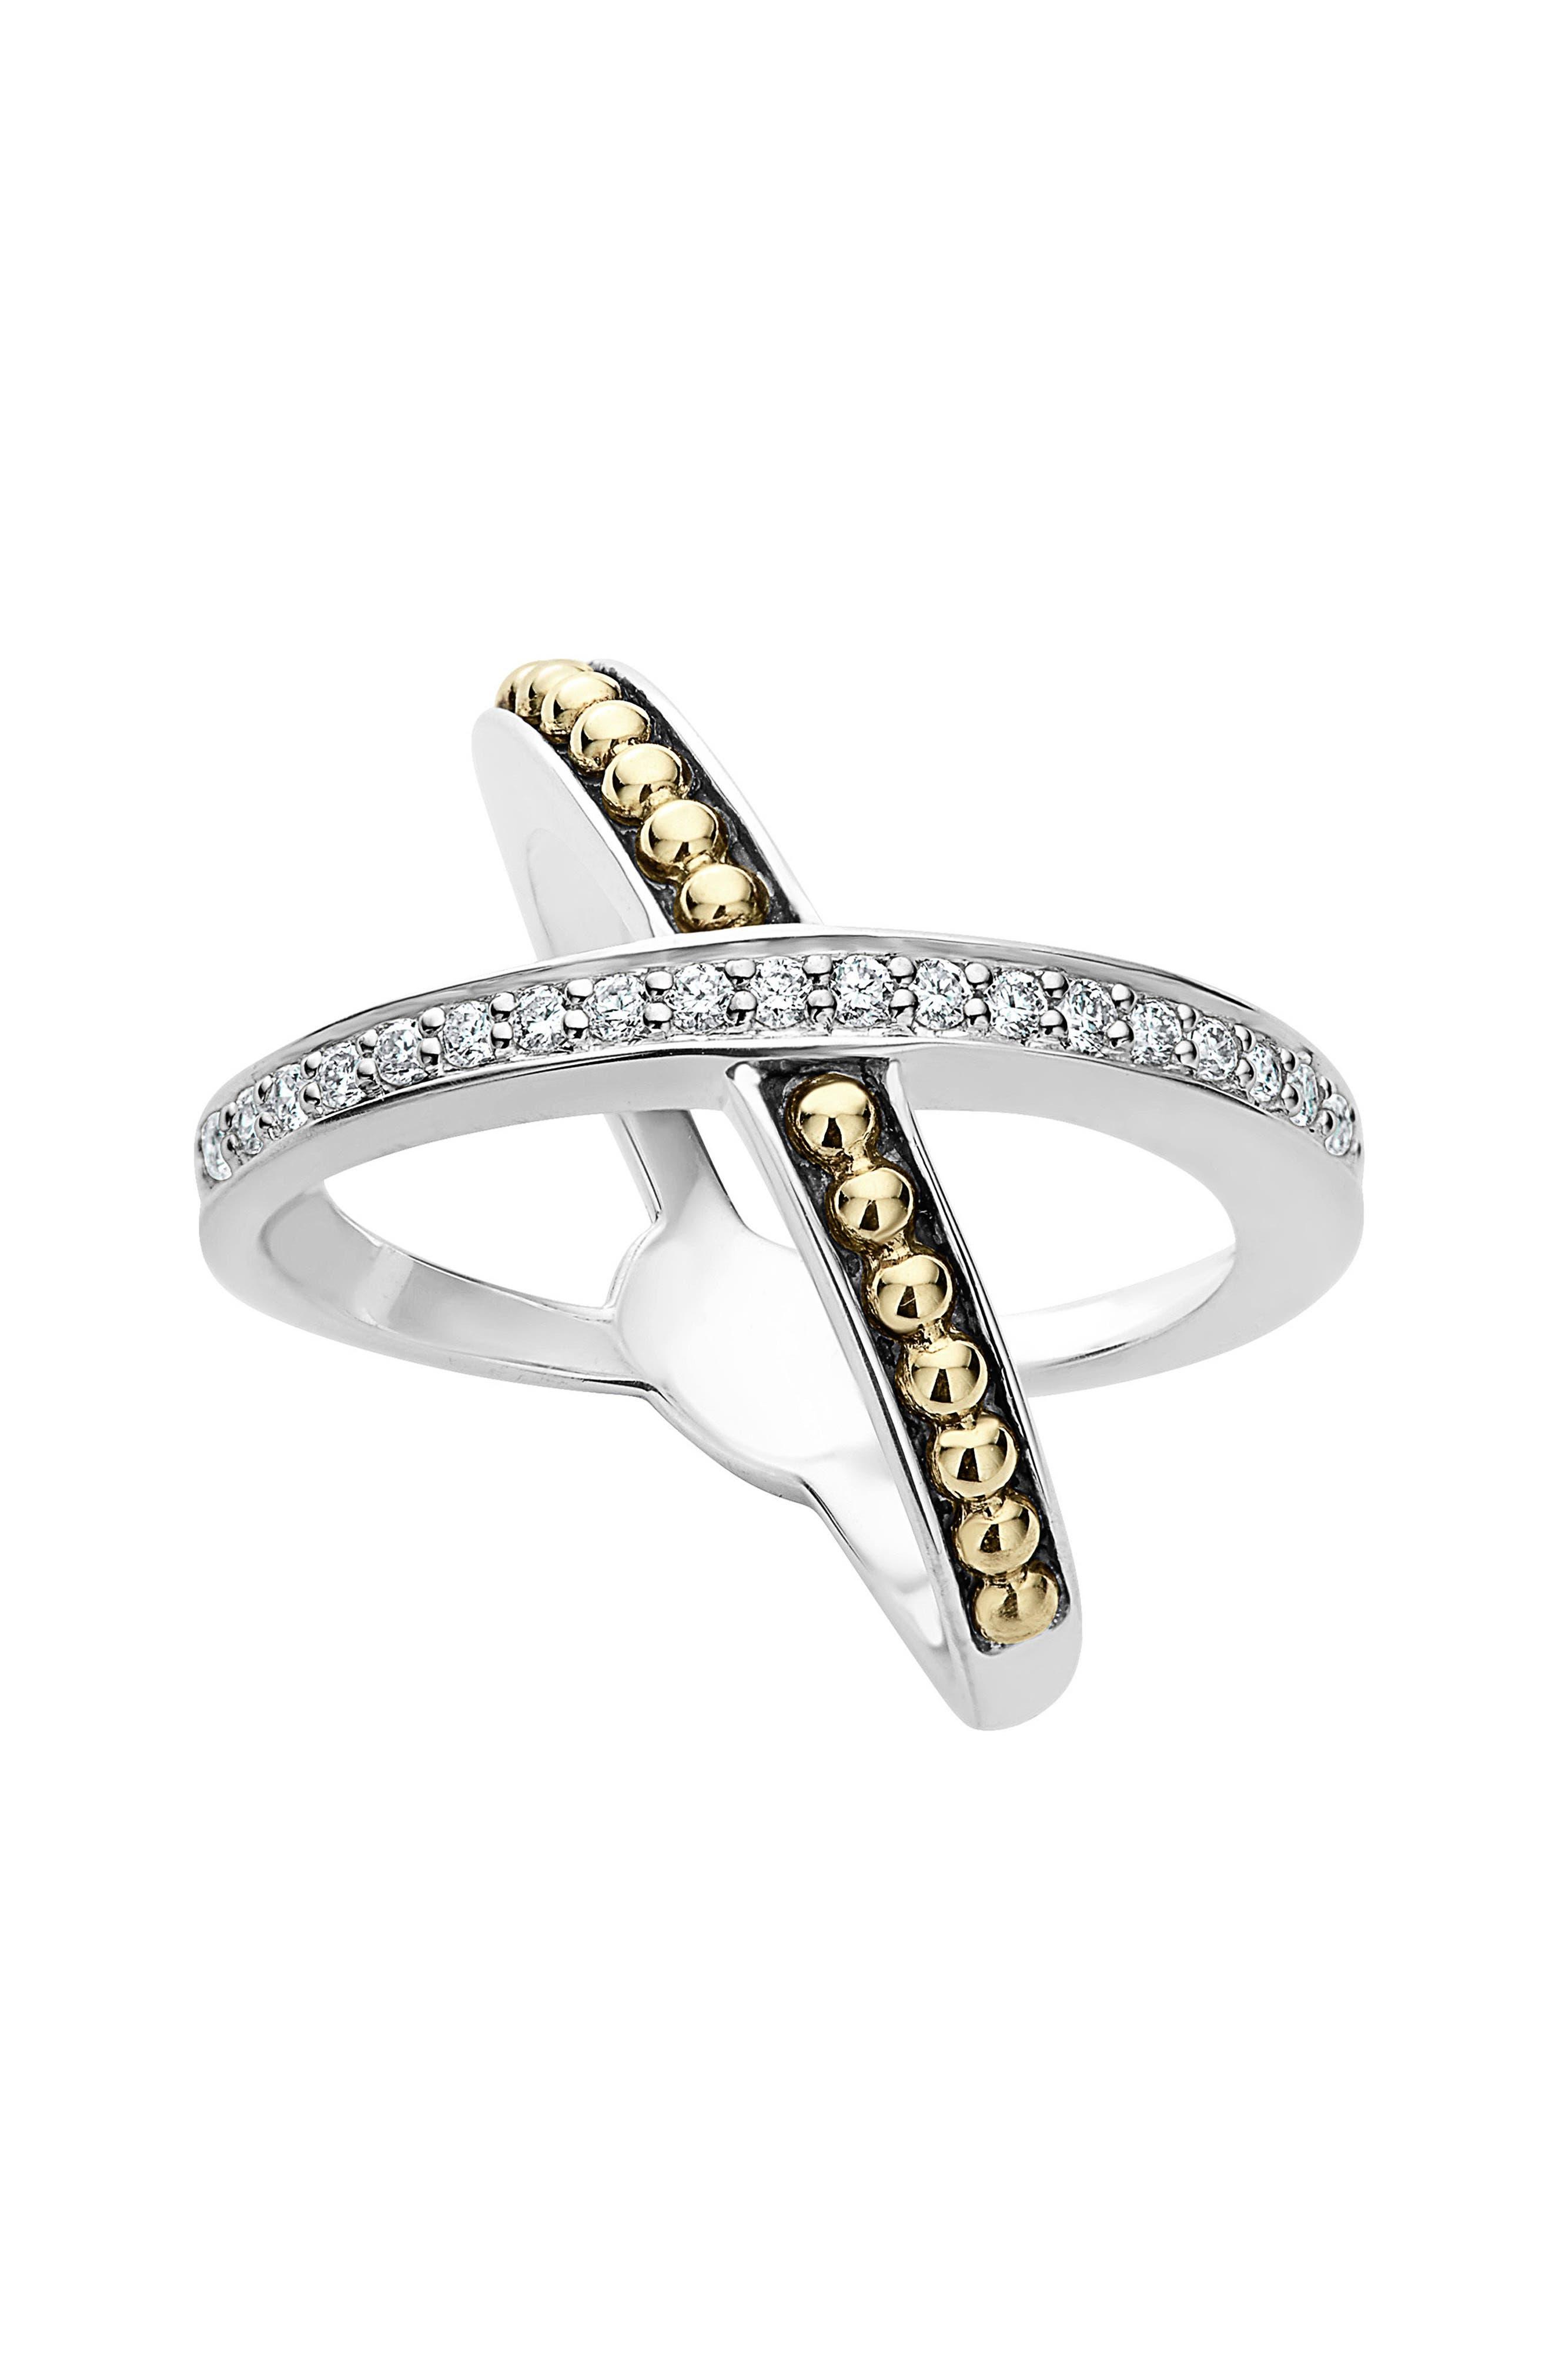 KSL Diamond Pavé Crossover Ring,                             Main thumbnail 1, color,                             SILVER/ GOLD/ DIAMOND